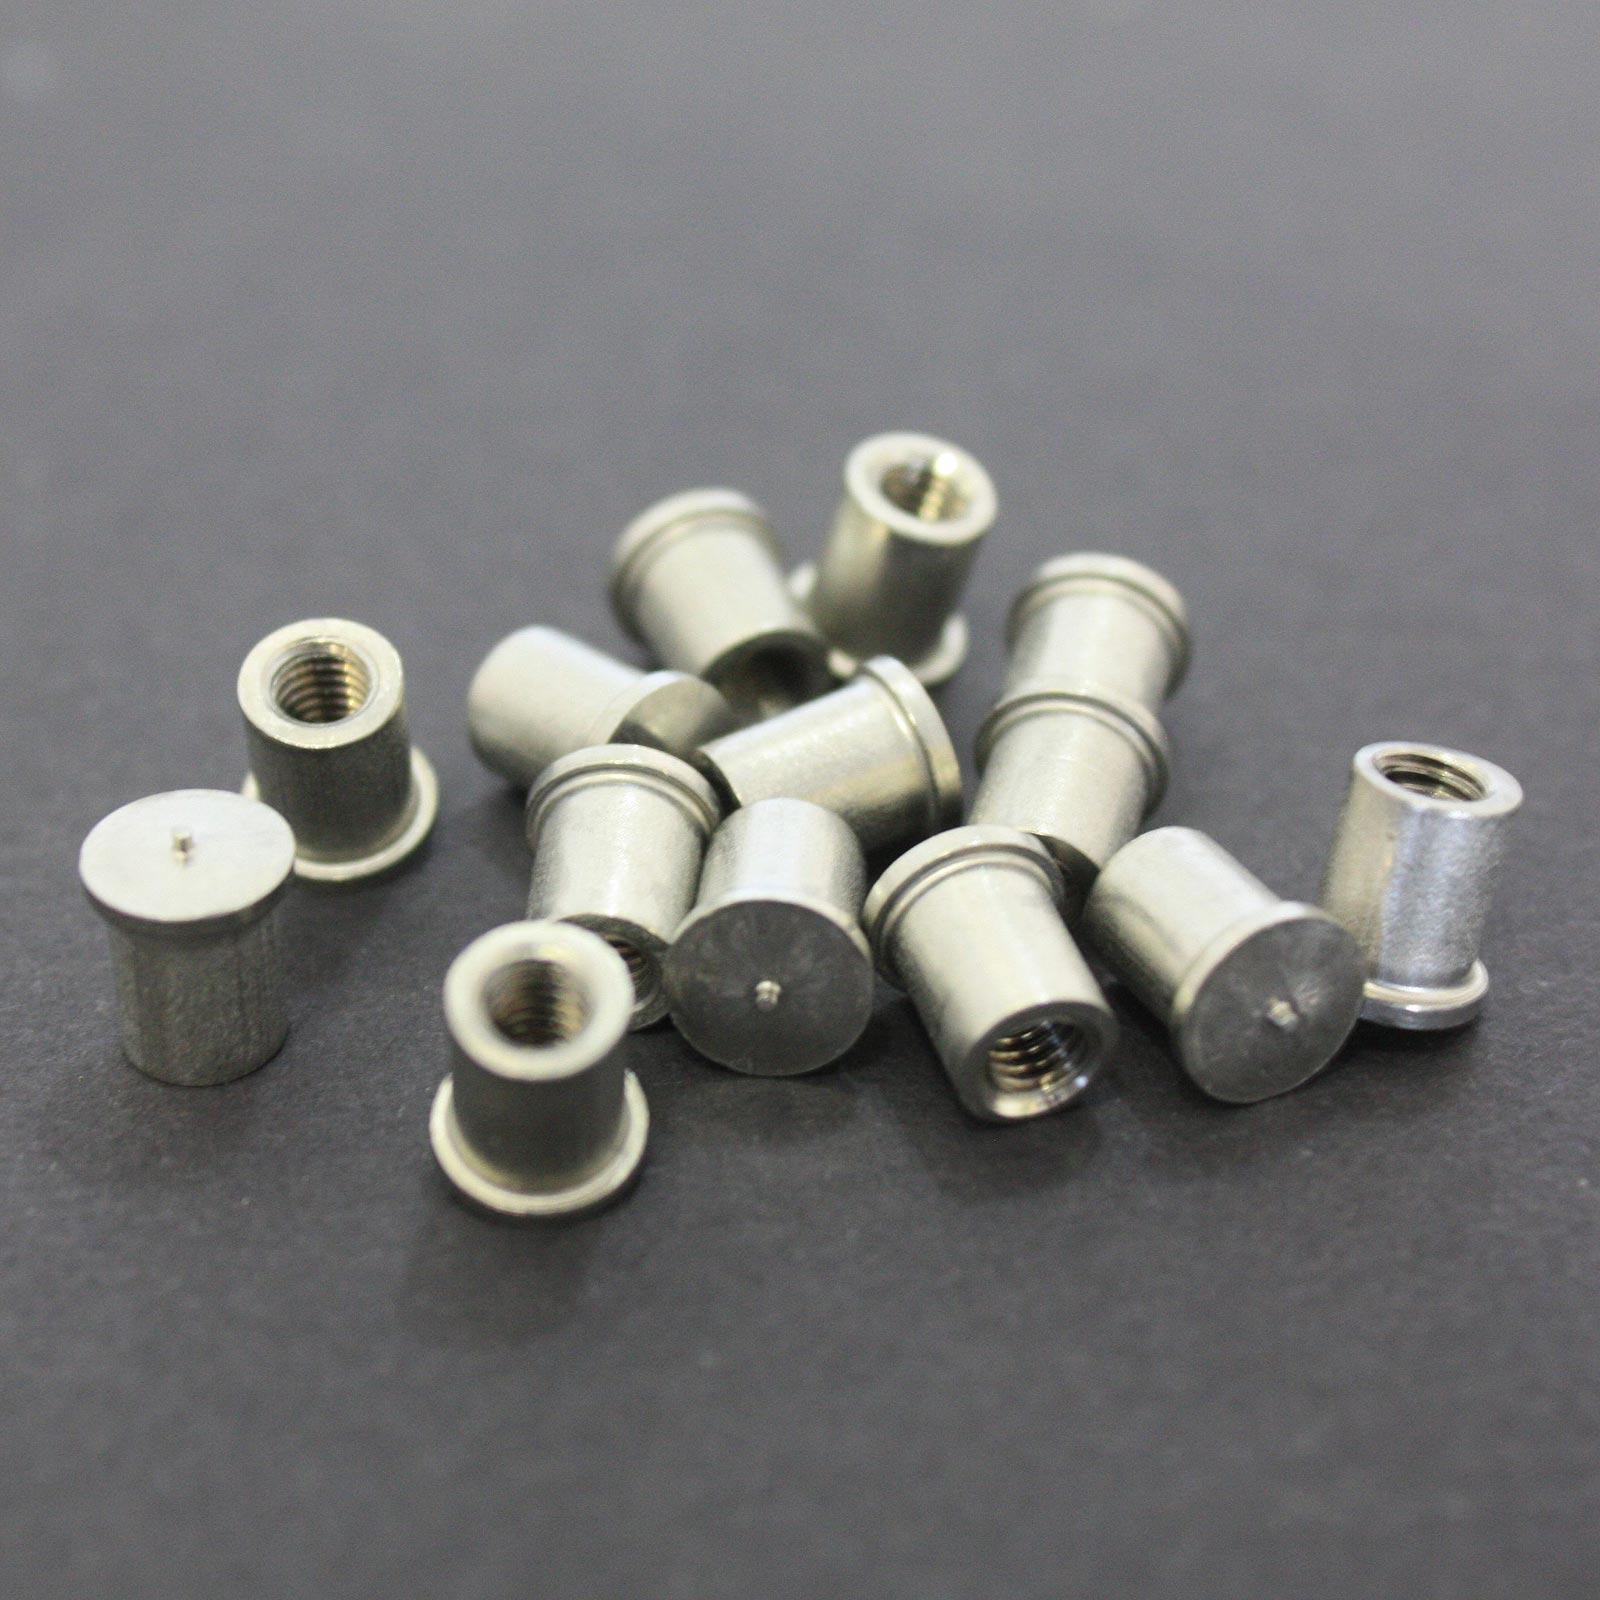 27 mm Innendurchmesser 1 53 mm Innenh/öhe T316 Edelstahl Packungsgr/ö/ße U-Bolzen M6 x25mm Gewinde